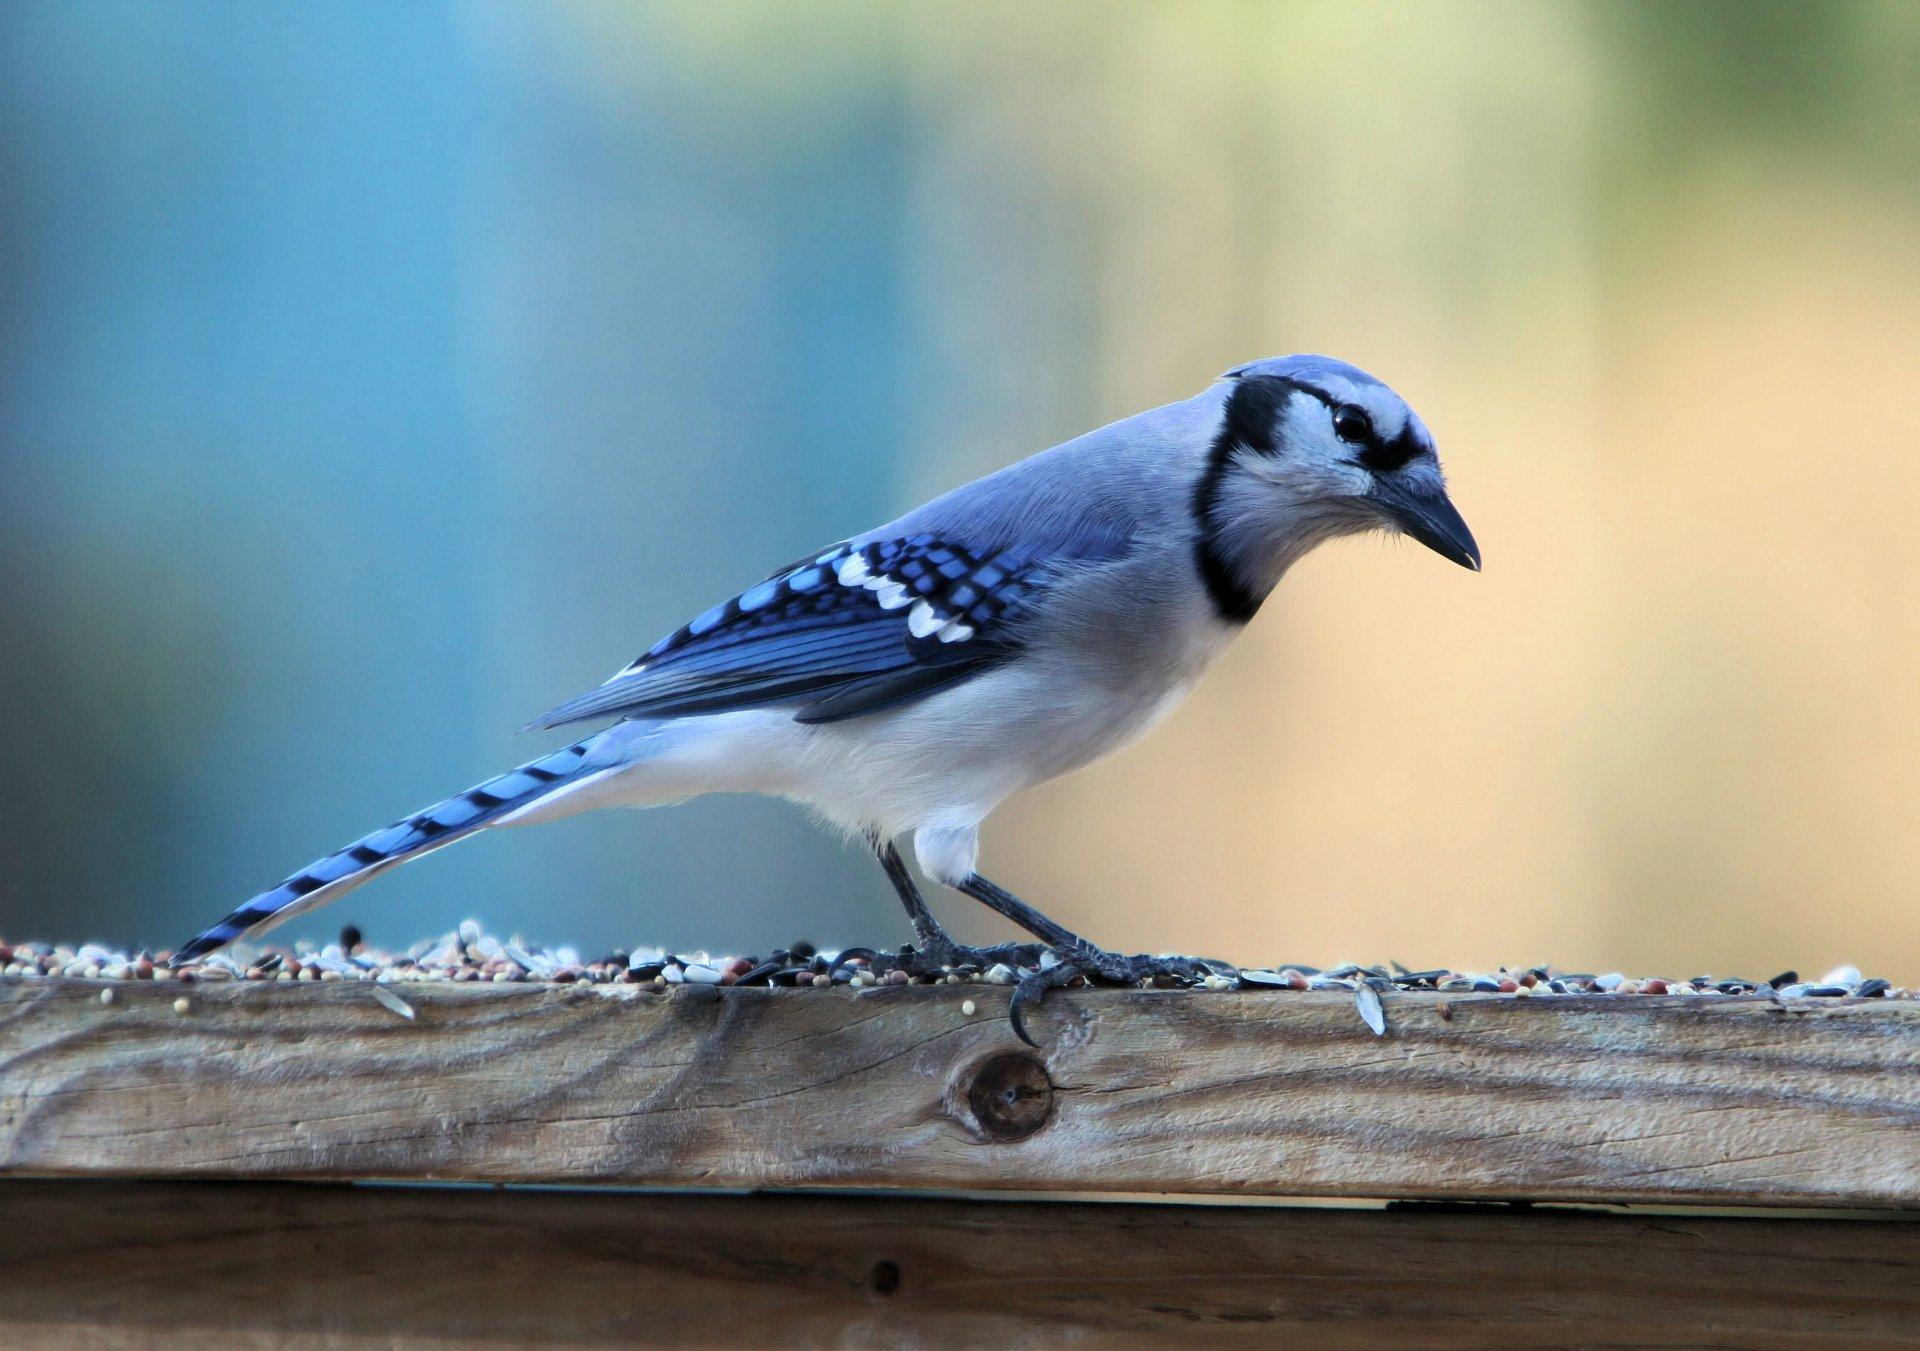 ACTION Photos of blue jays birds